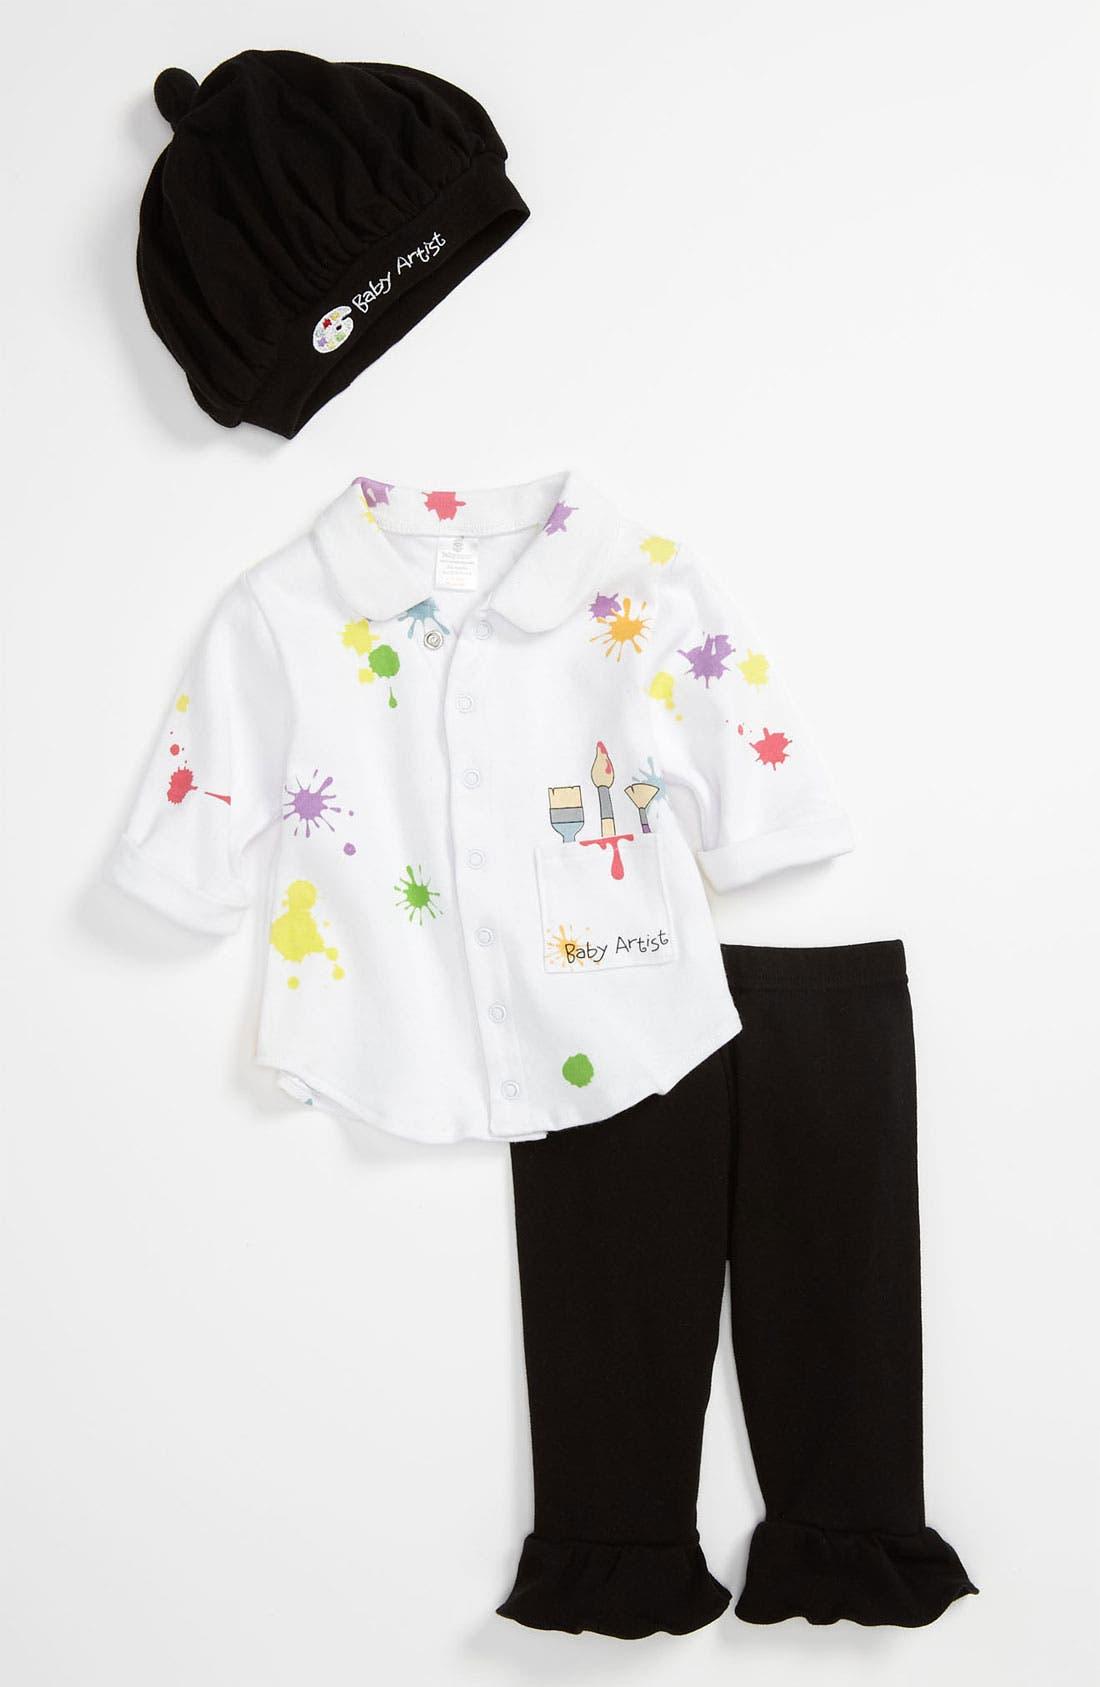 Main Image - Baby Aspen 'Baby Artist' Shirt, Pants & Hat (Baby)